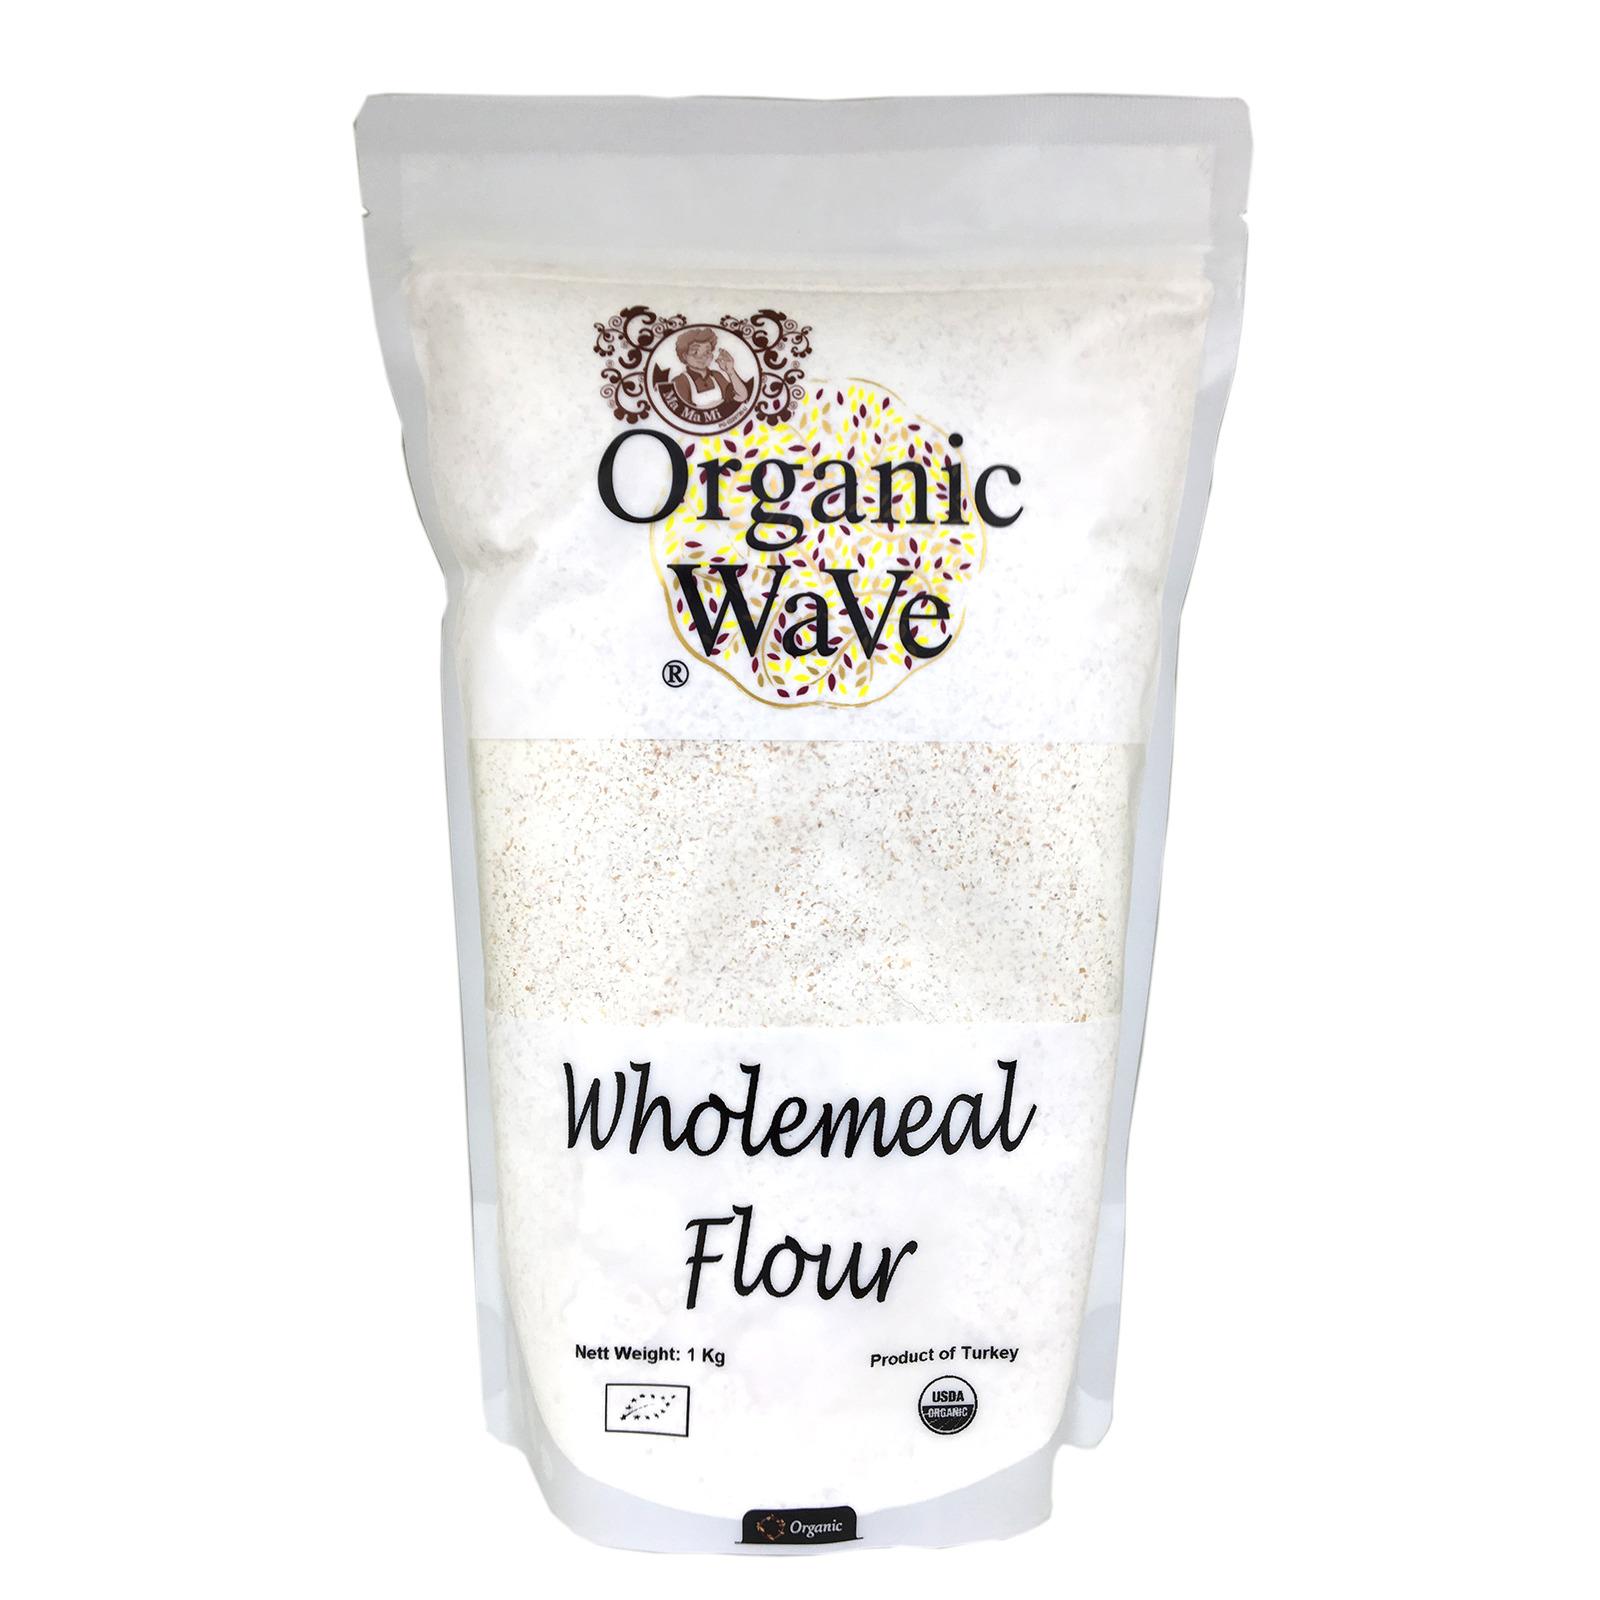 Organic Wave Wholemeal Flour